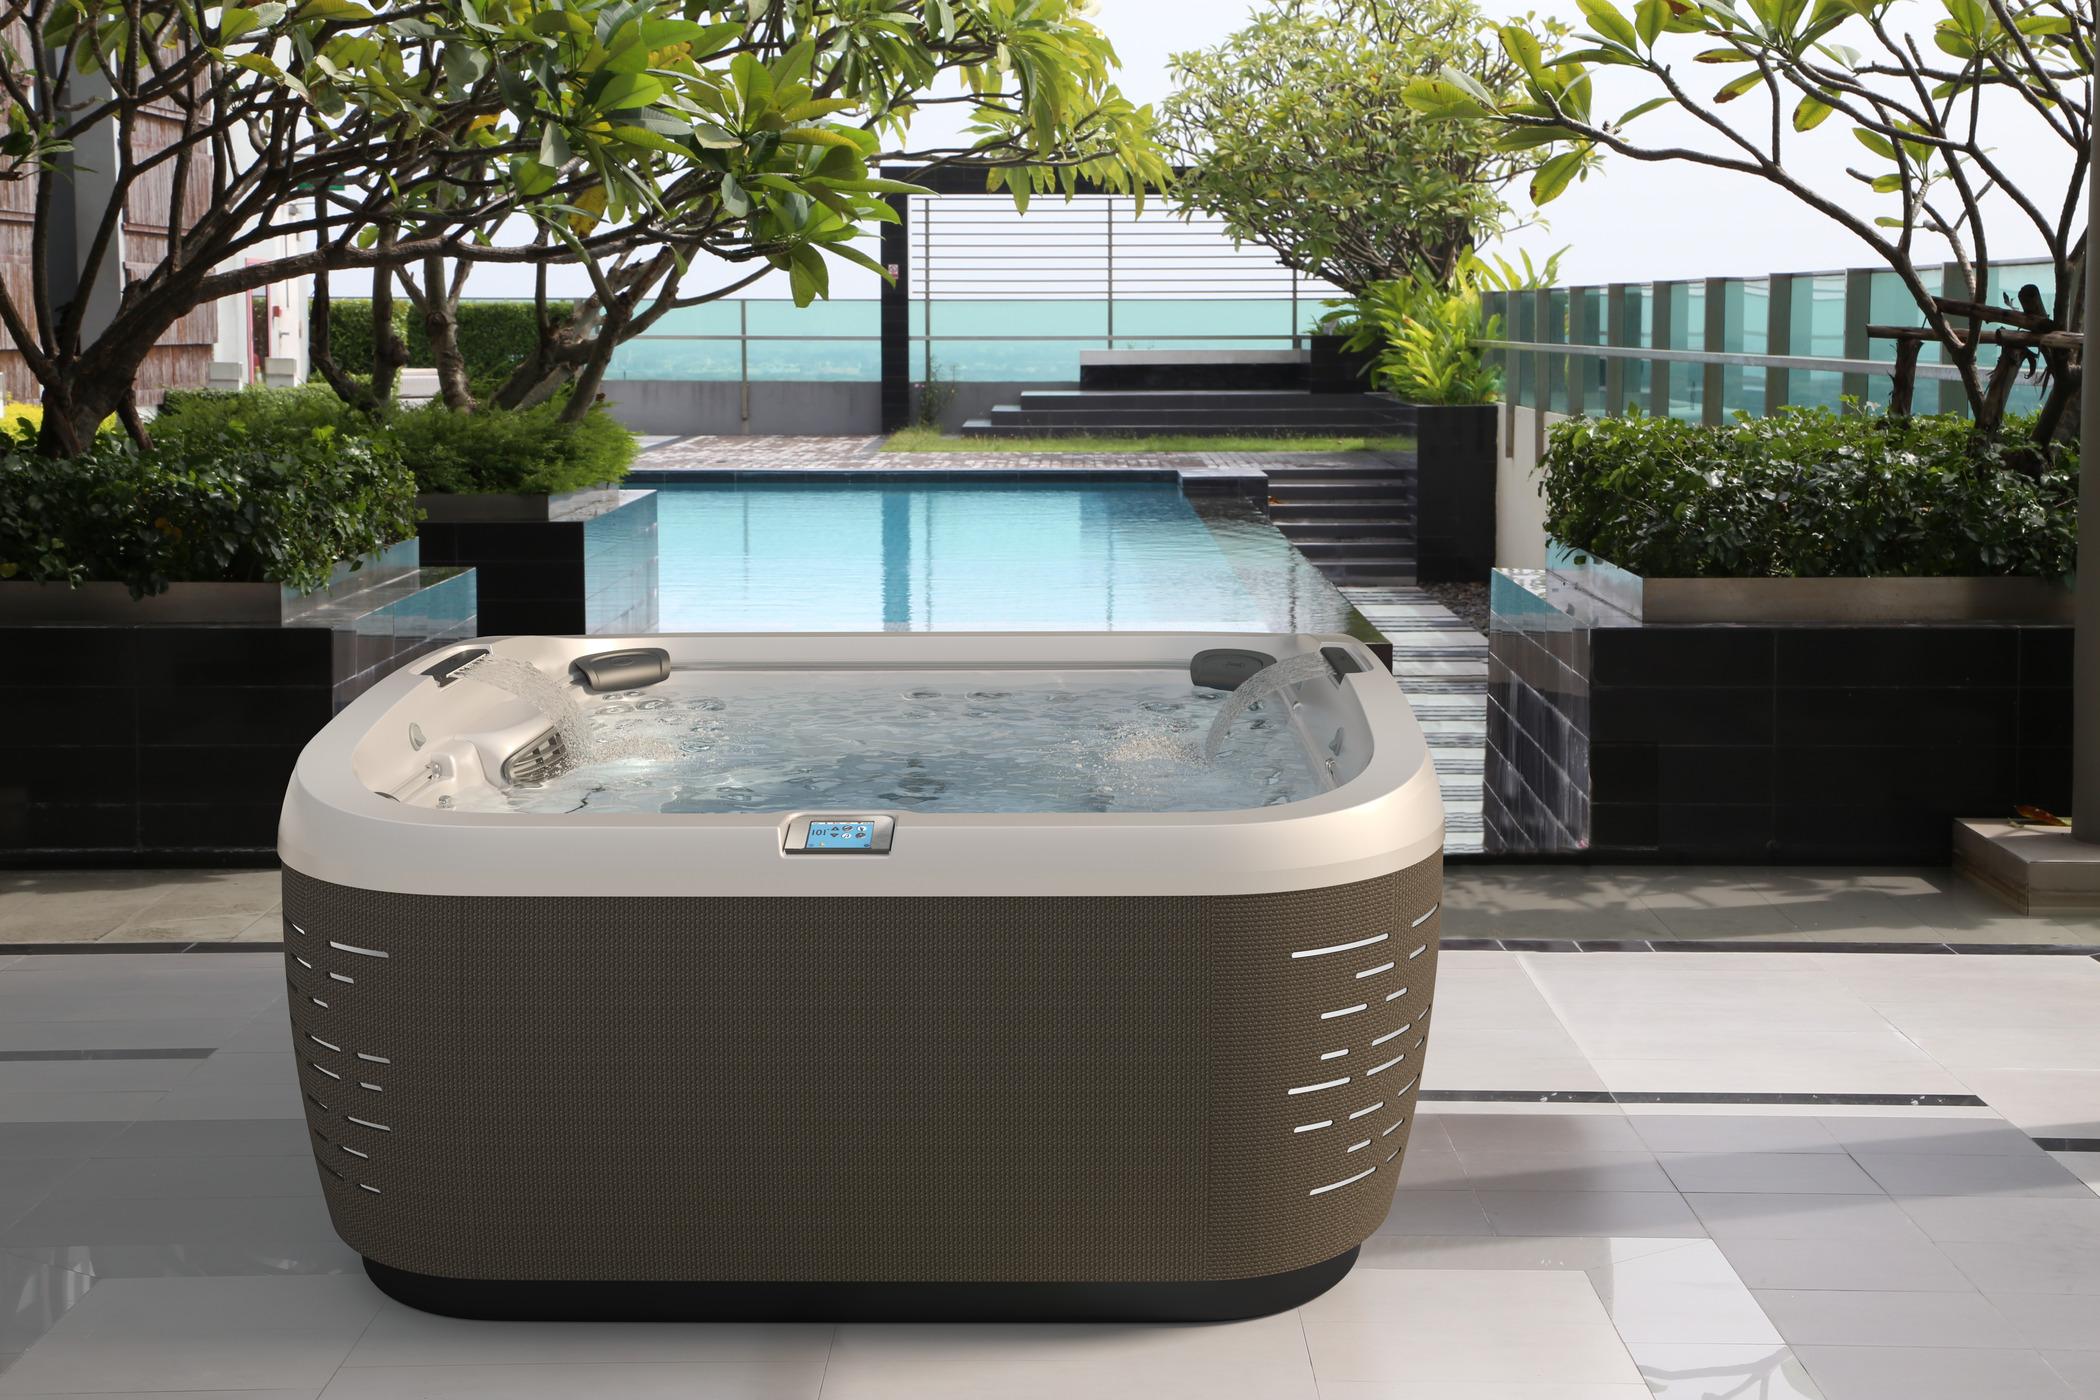 Jacuzzi Hot Tub Savings